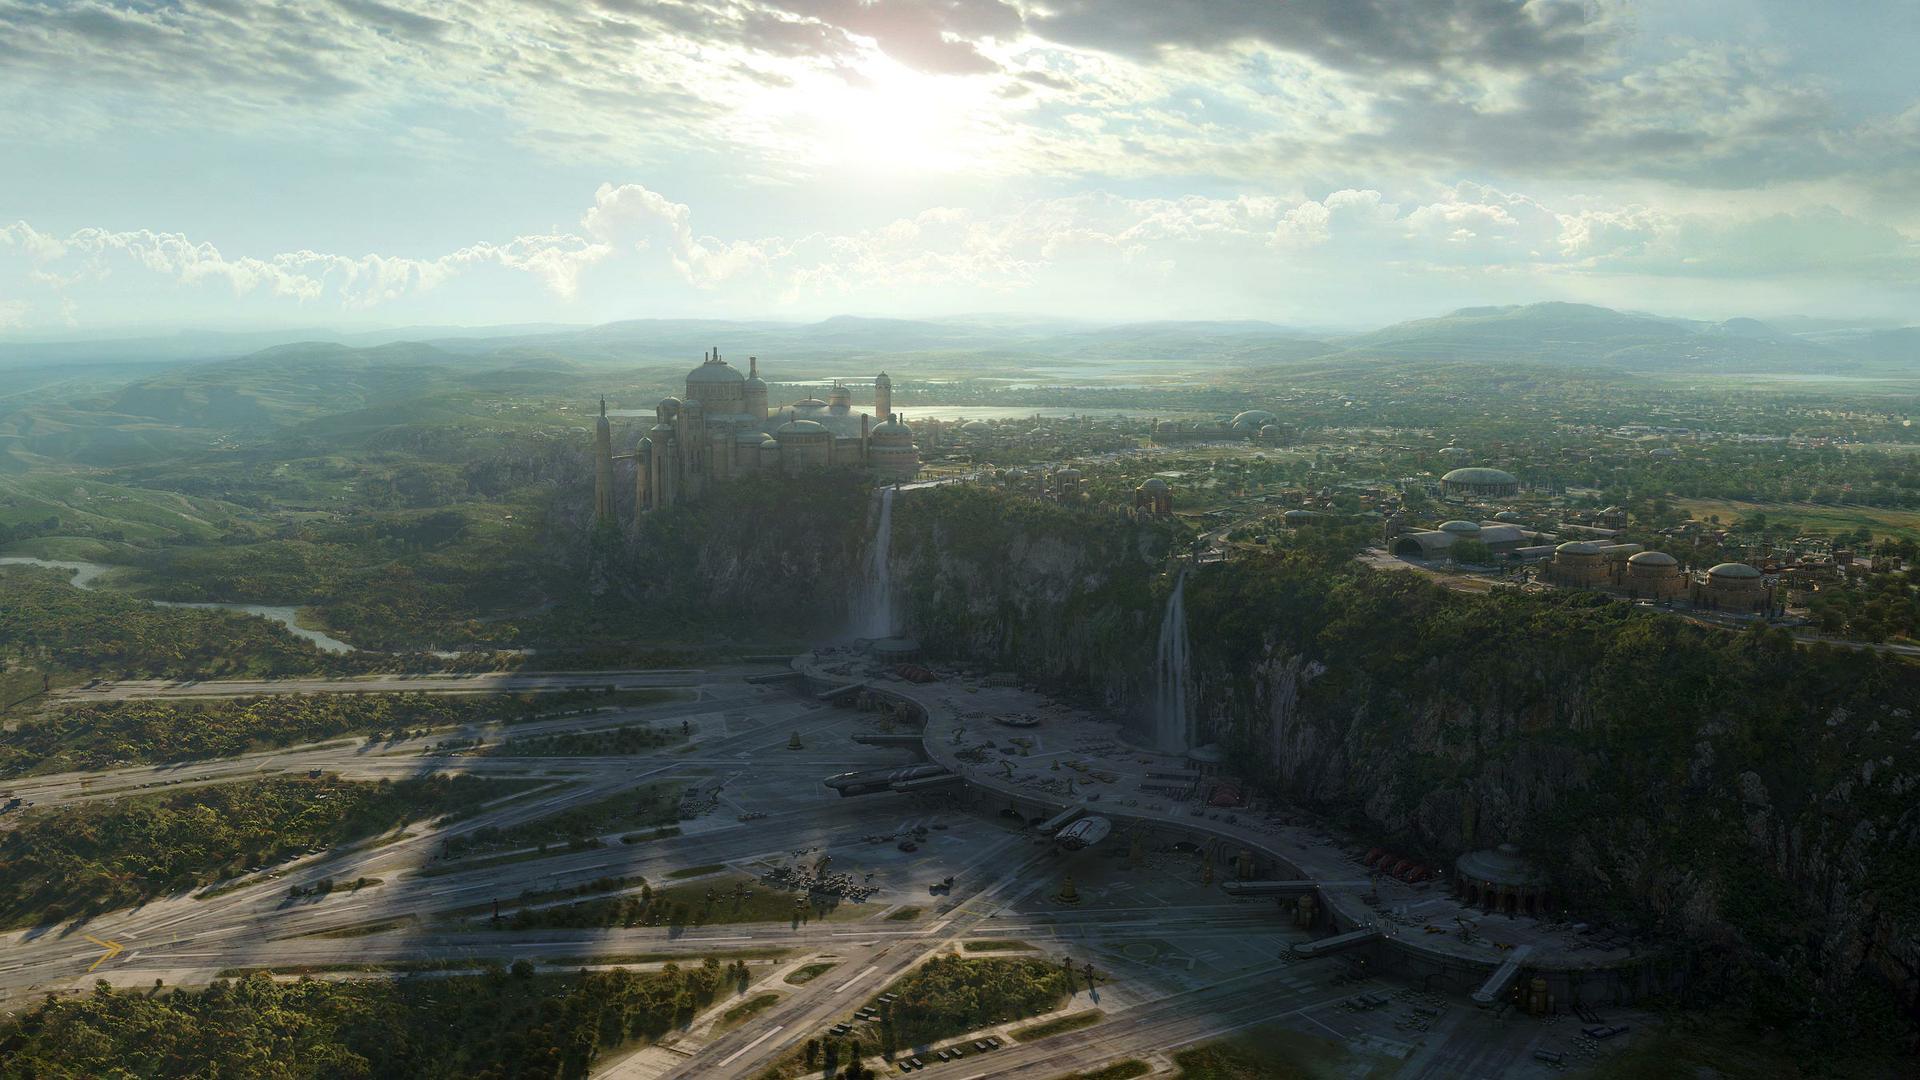 Star Wars Battlefront I, II, III: Геймплей Star Wars Battlefront II покажут в следующую субботу